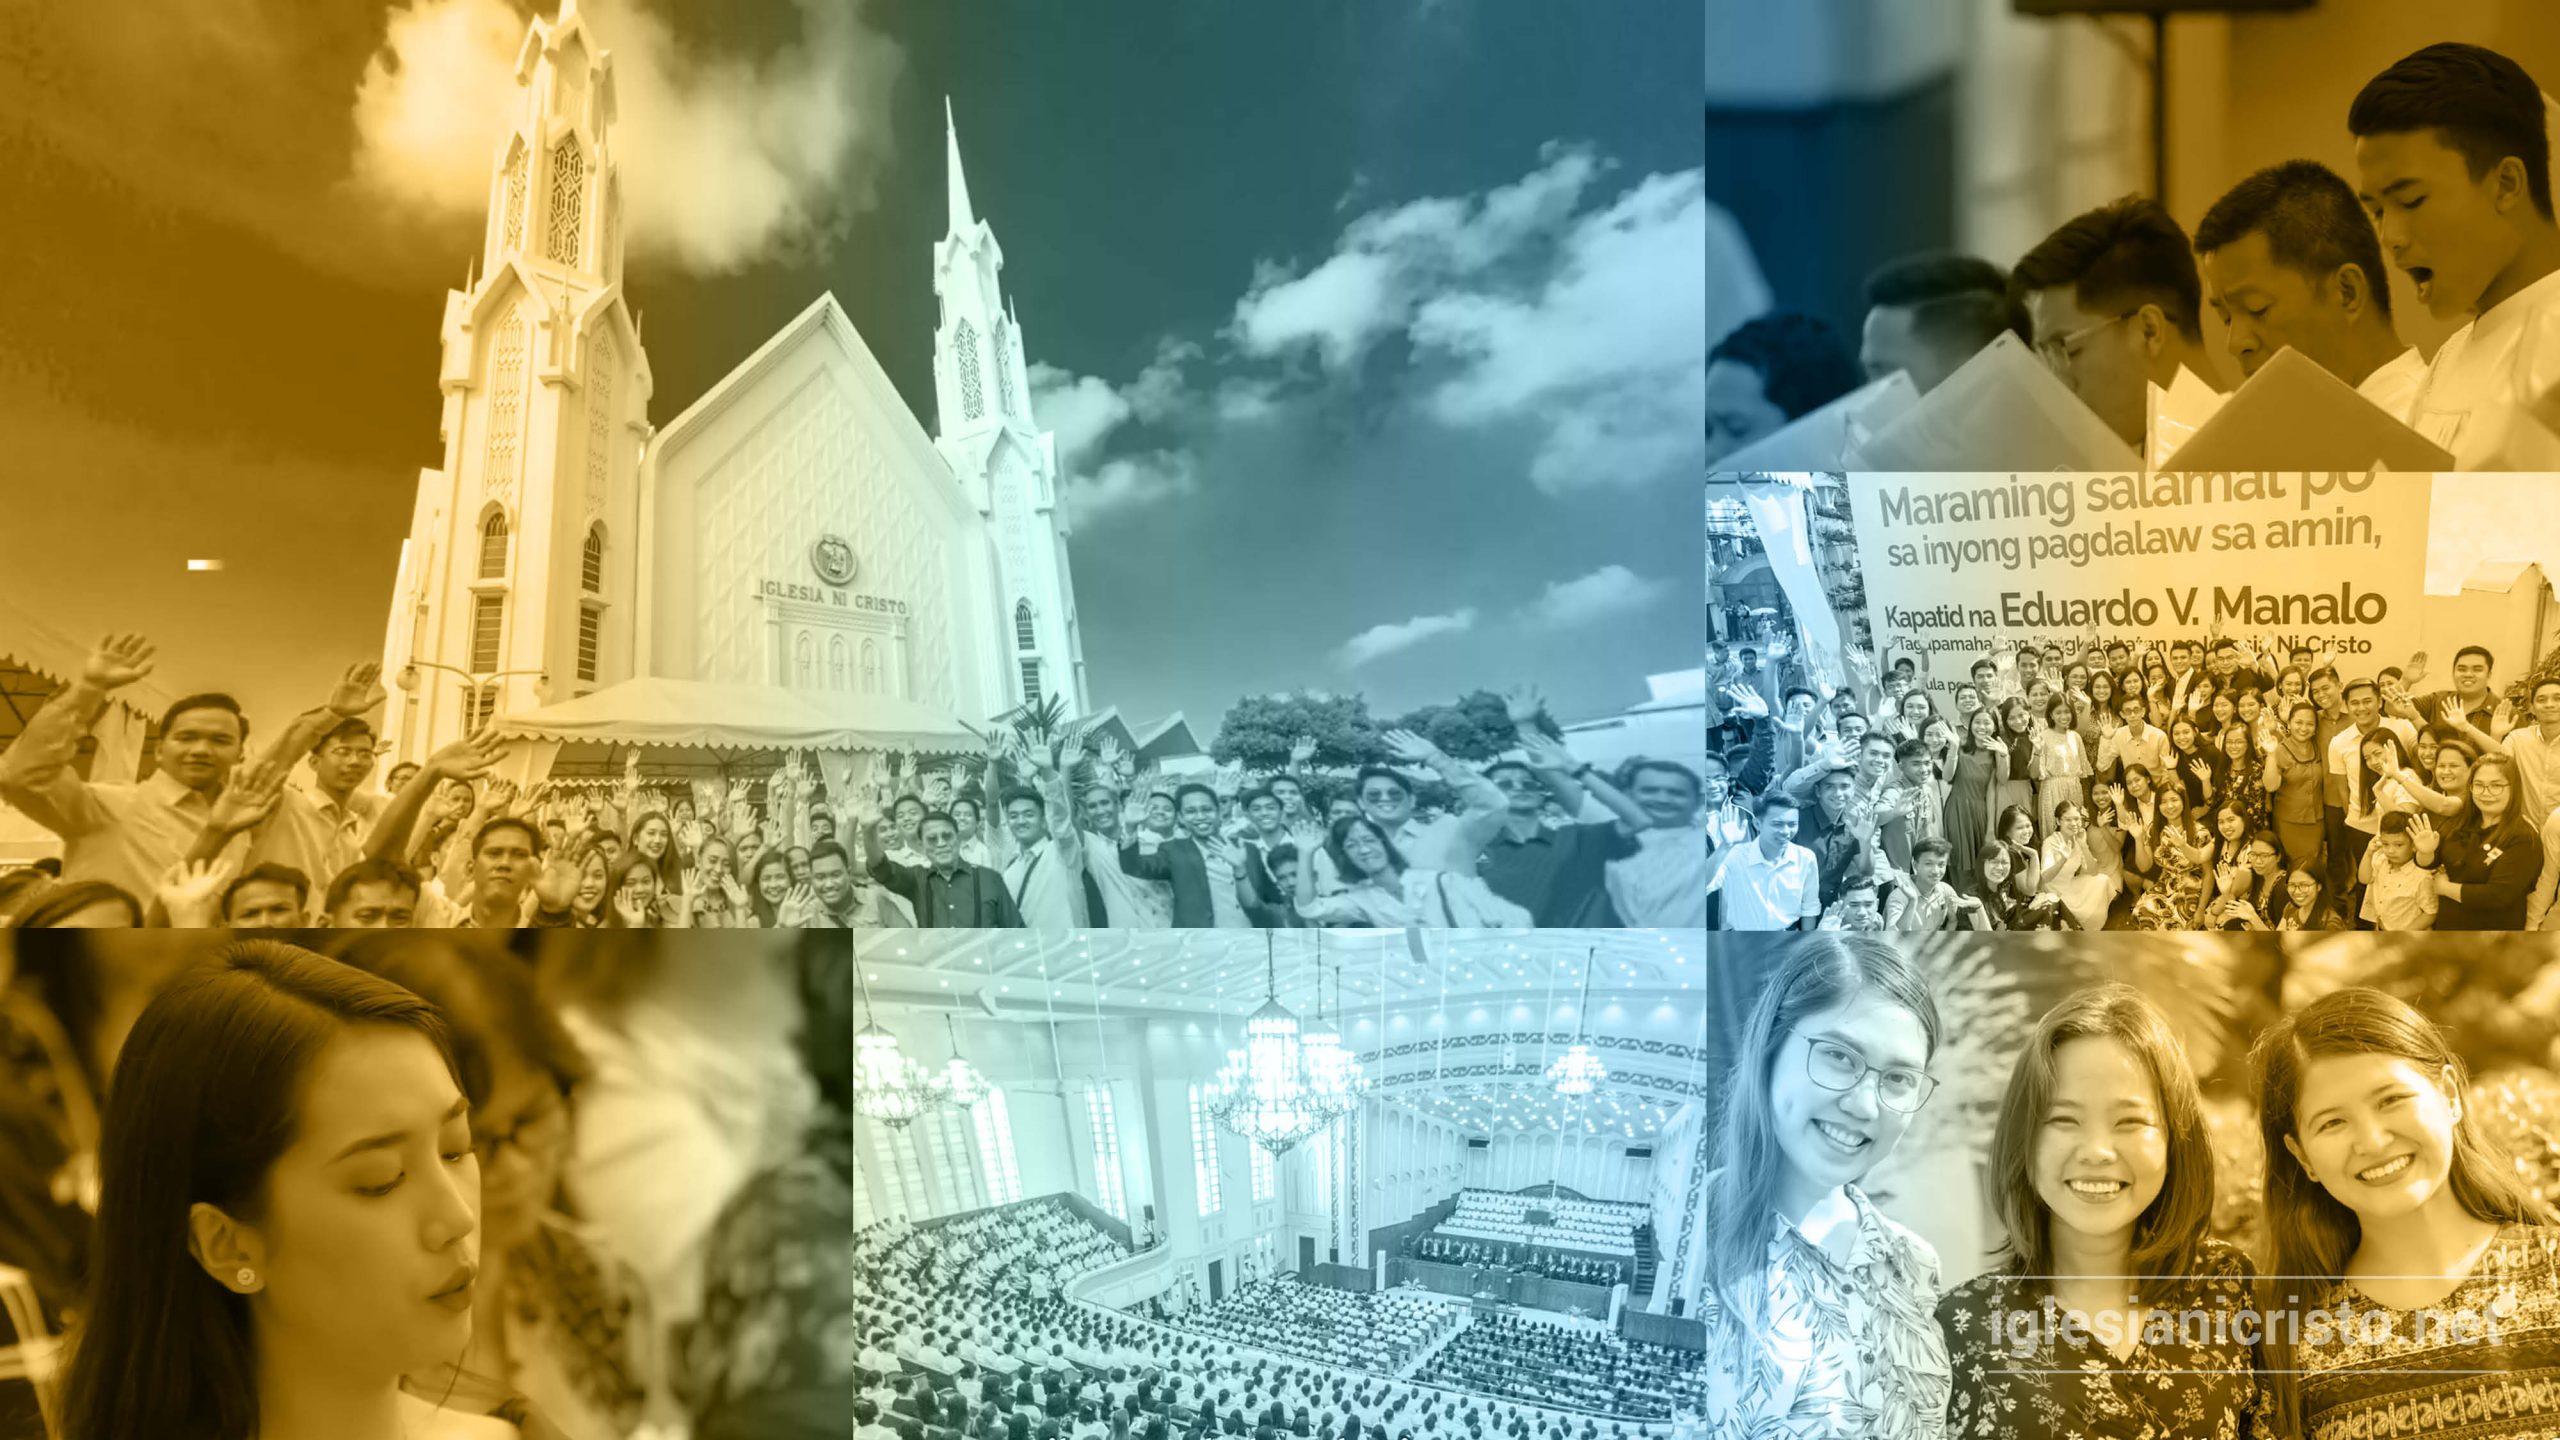 Brethren in San Fernando, Pampanga receive spiritual nourishment through Executive Minister's pastoral visit